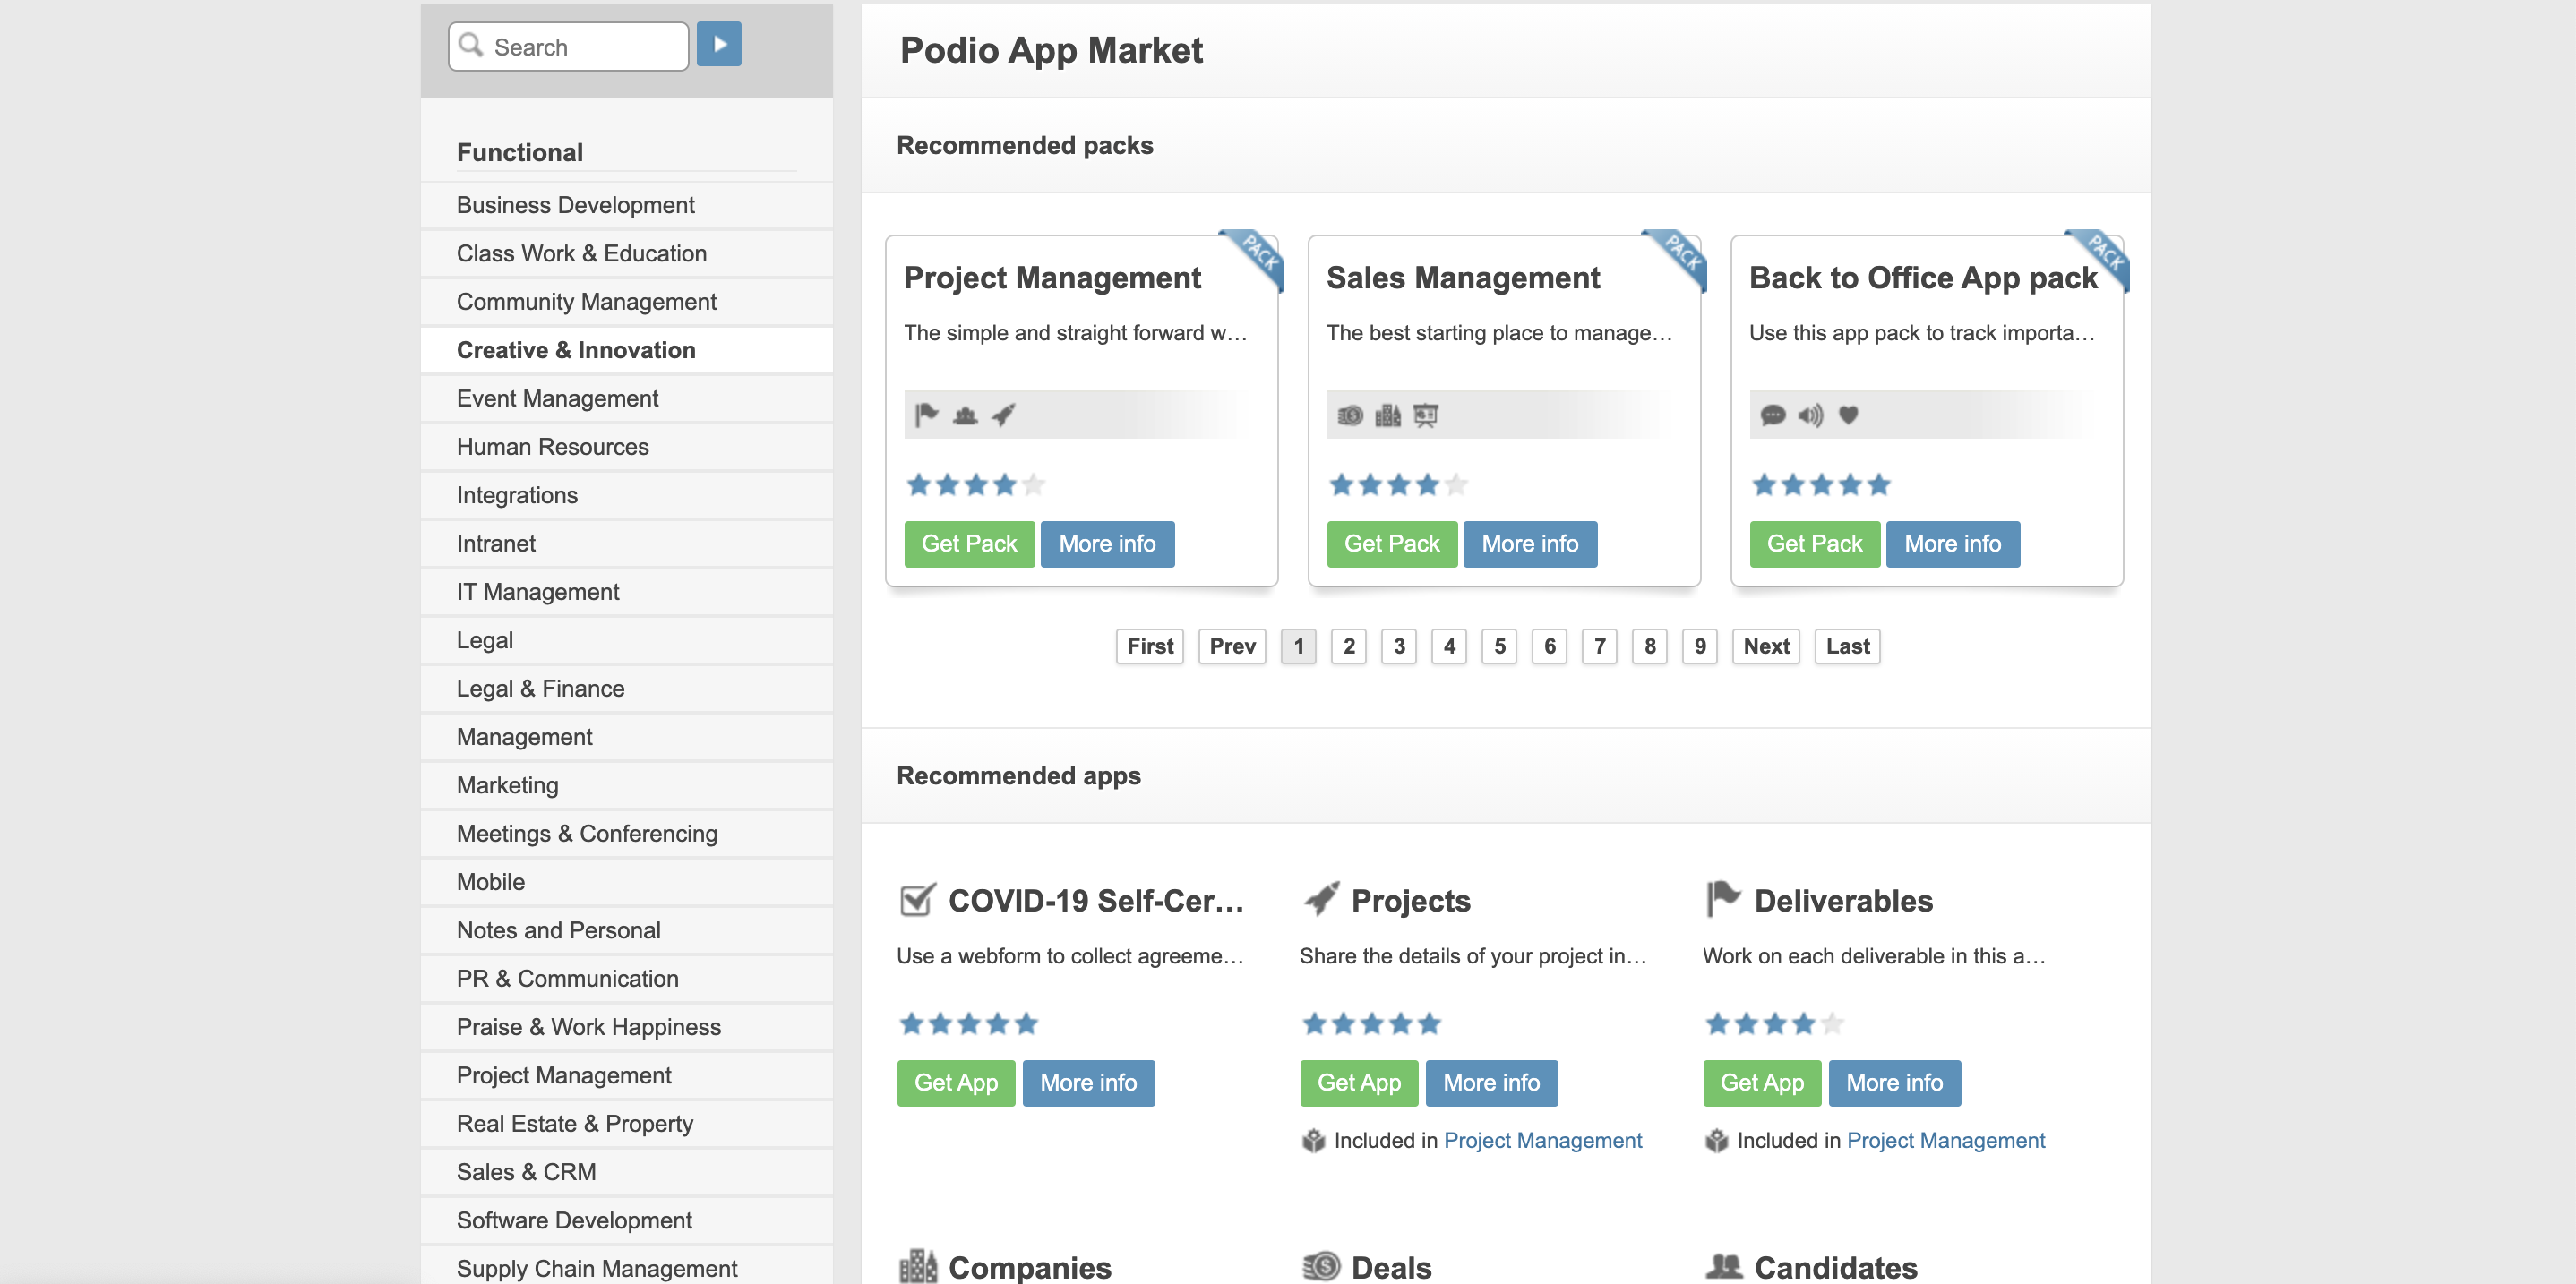 Podio App Market